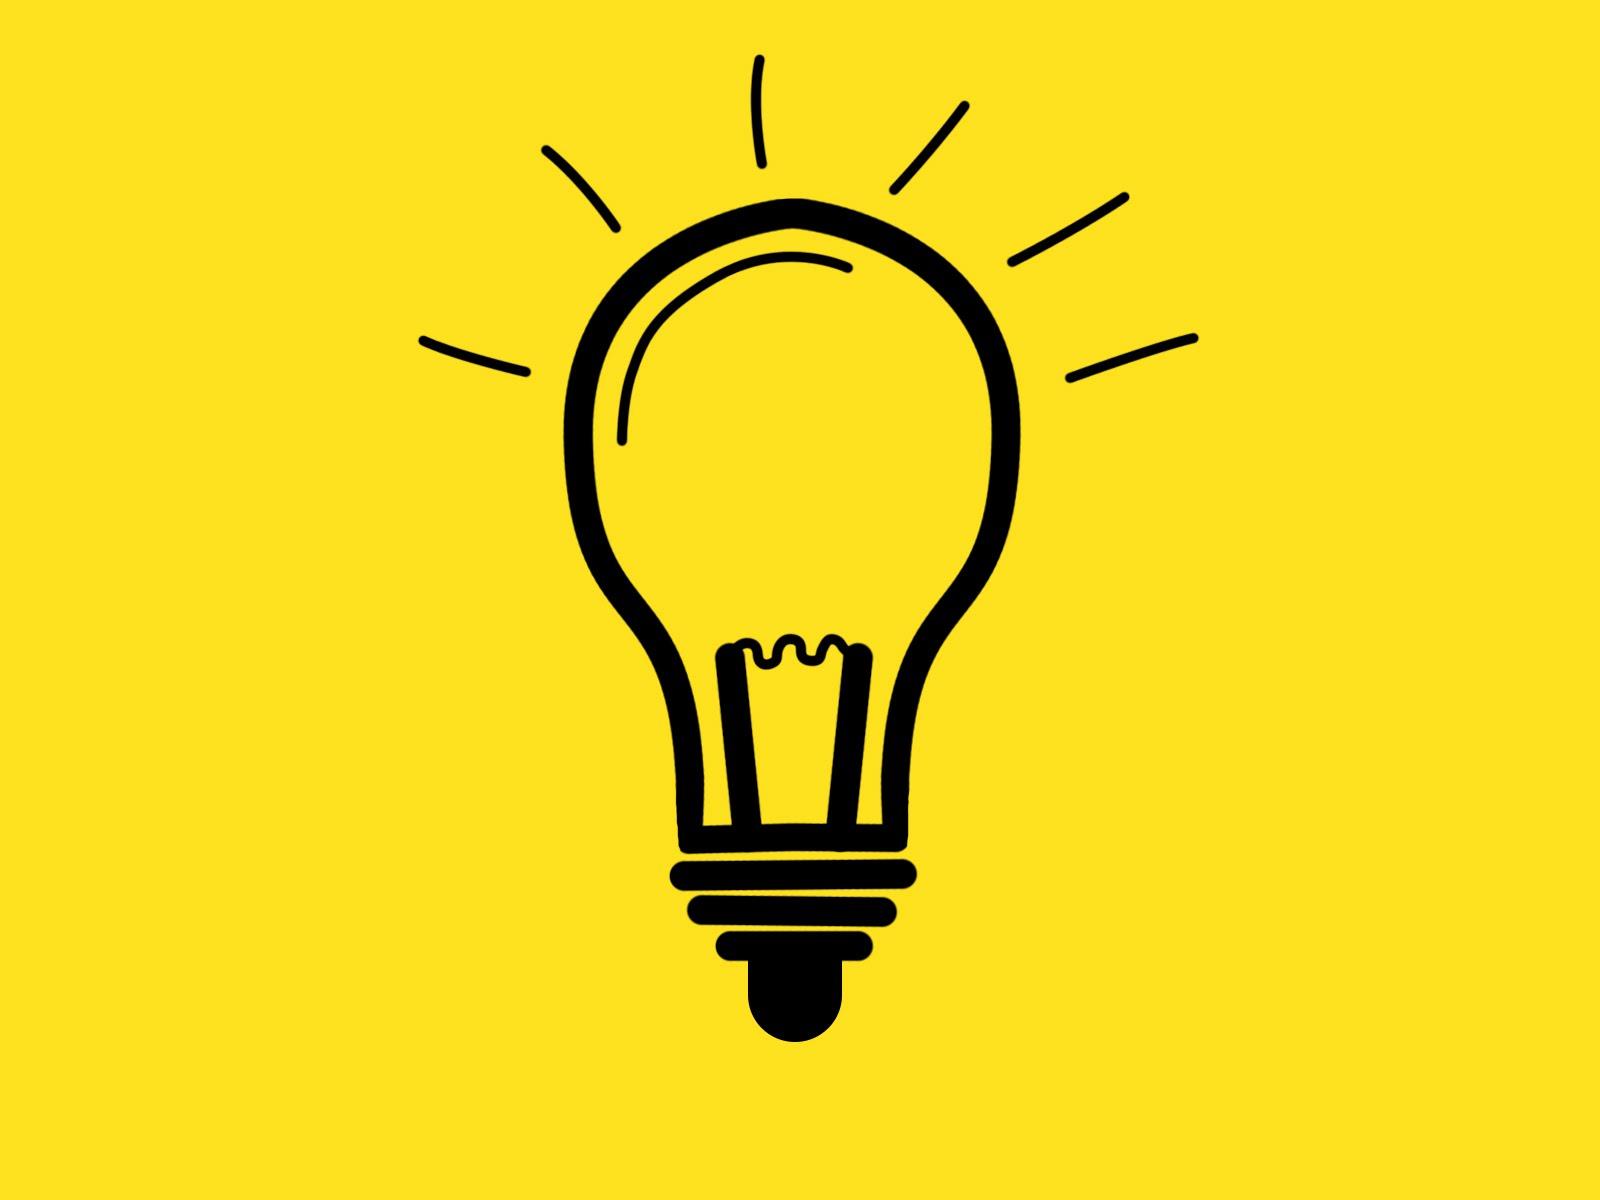 1600x1200 Simple Ideas Photoshop Clipart Clip Art Tutorial How To Make Bulb